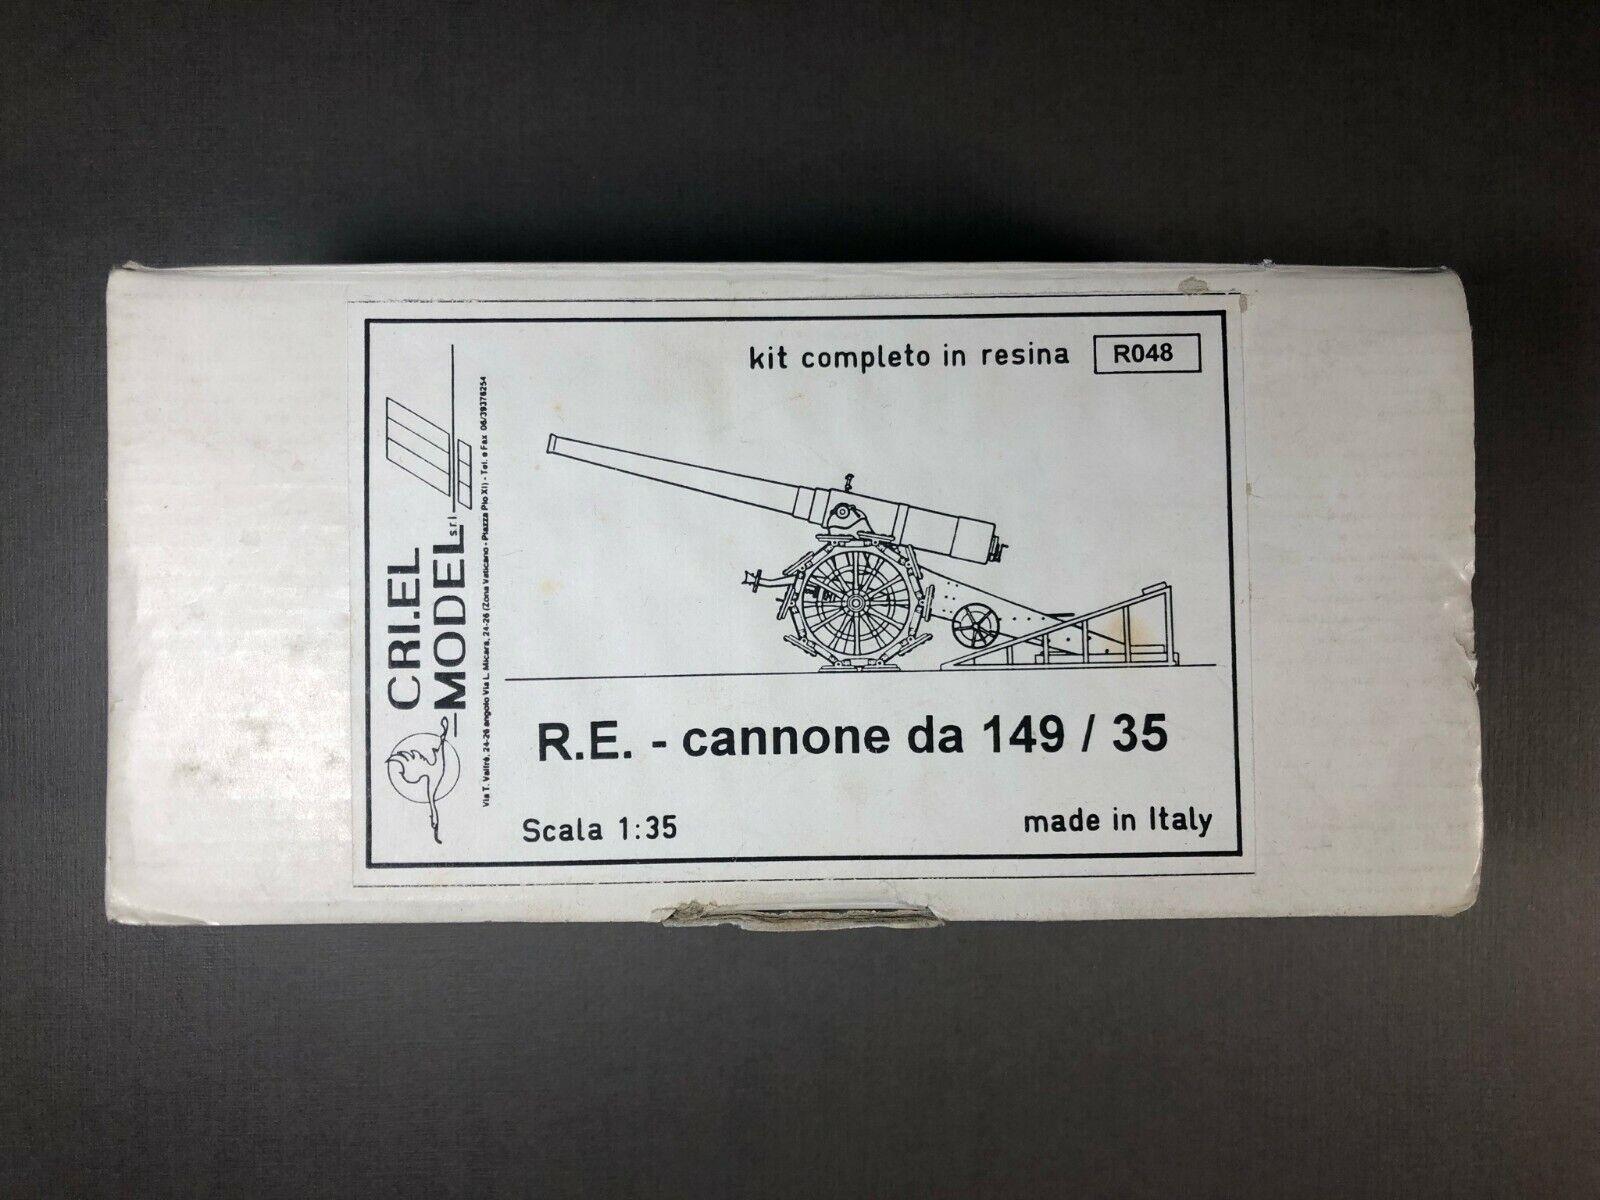 estilo clásico Italian Heavy Gun Cannone da 149 35 1 1 1 35 Resin Criel Crielmodel R048 Cri.el  Ven a elegir tu propio estilo deportivo.